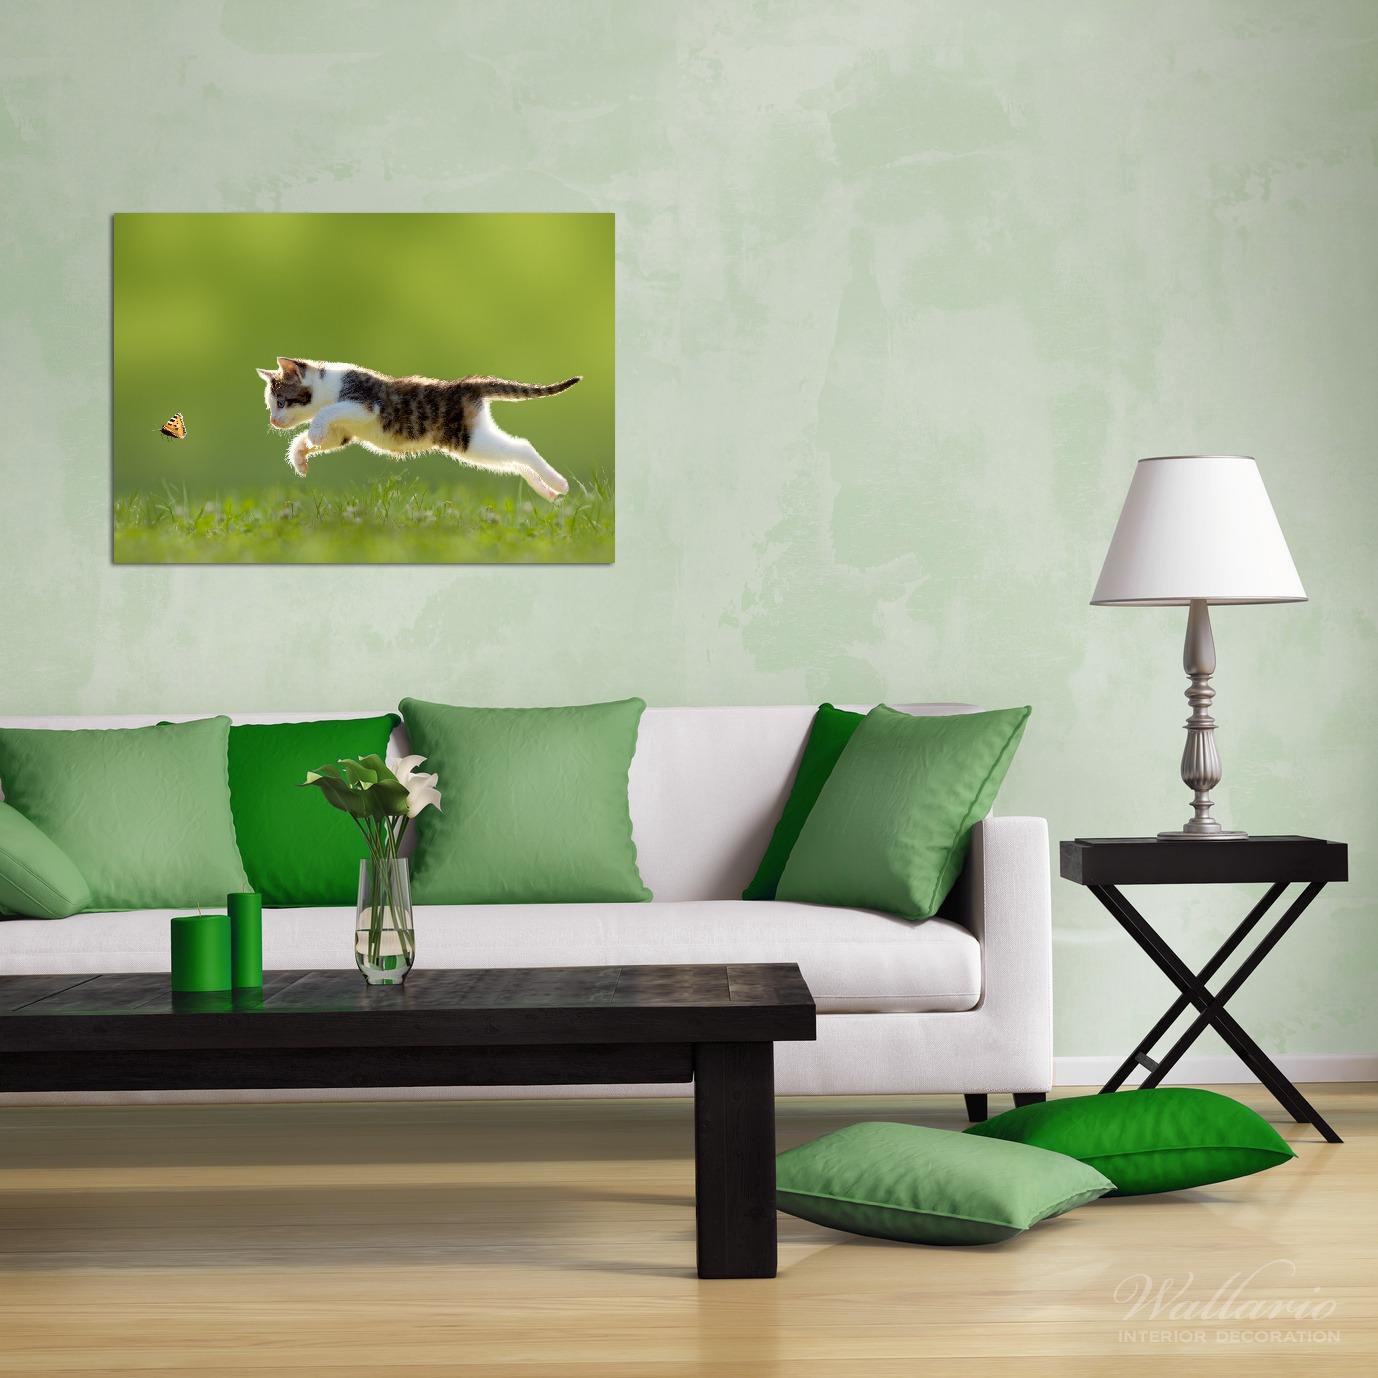 Wandbild Süße Katze fängt Schmetterling im Grünen – Bild 2